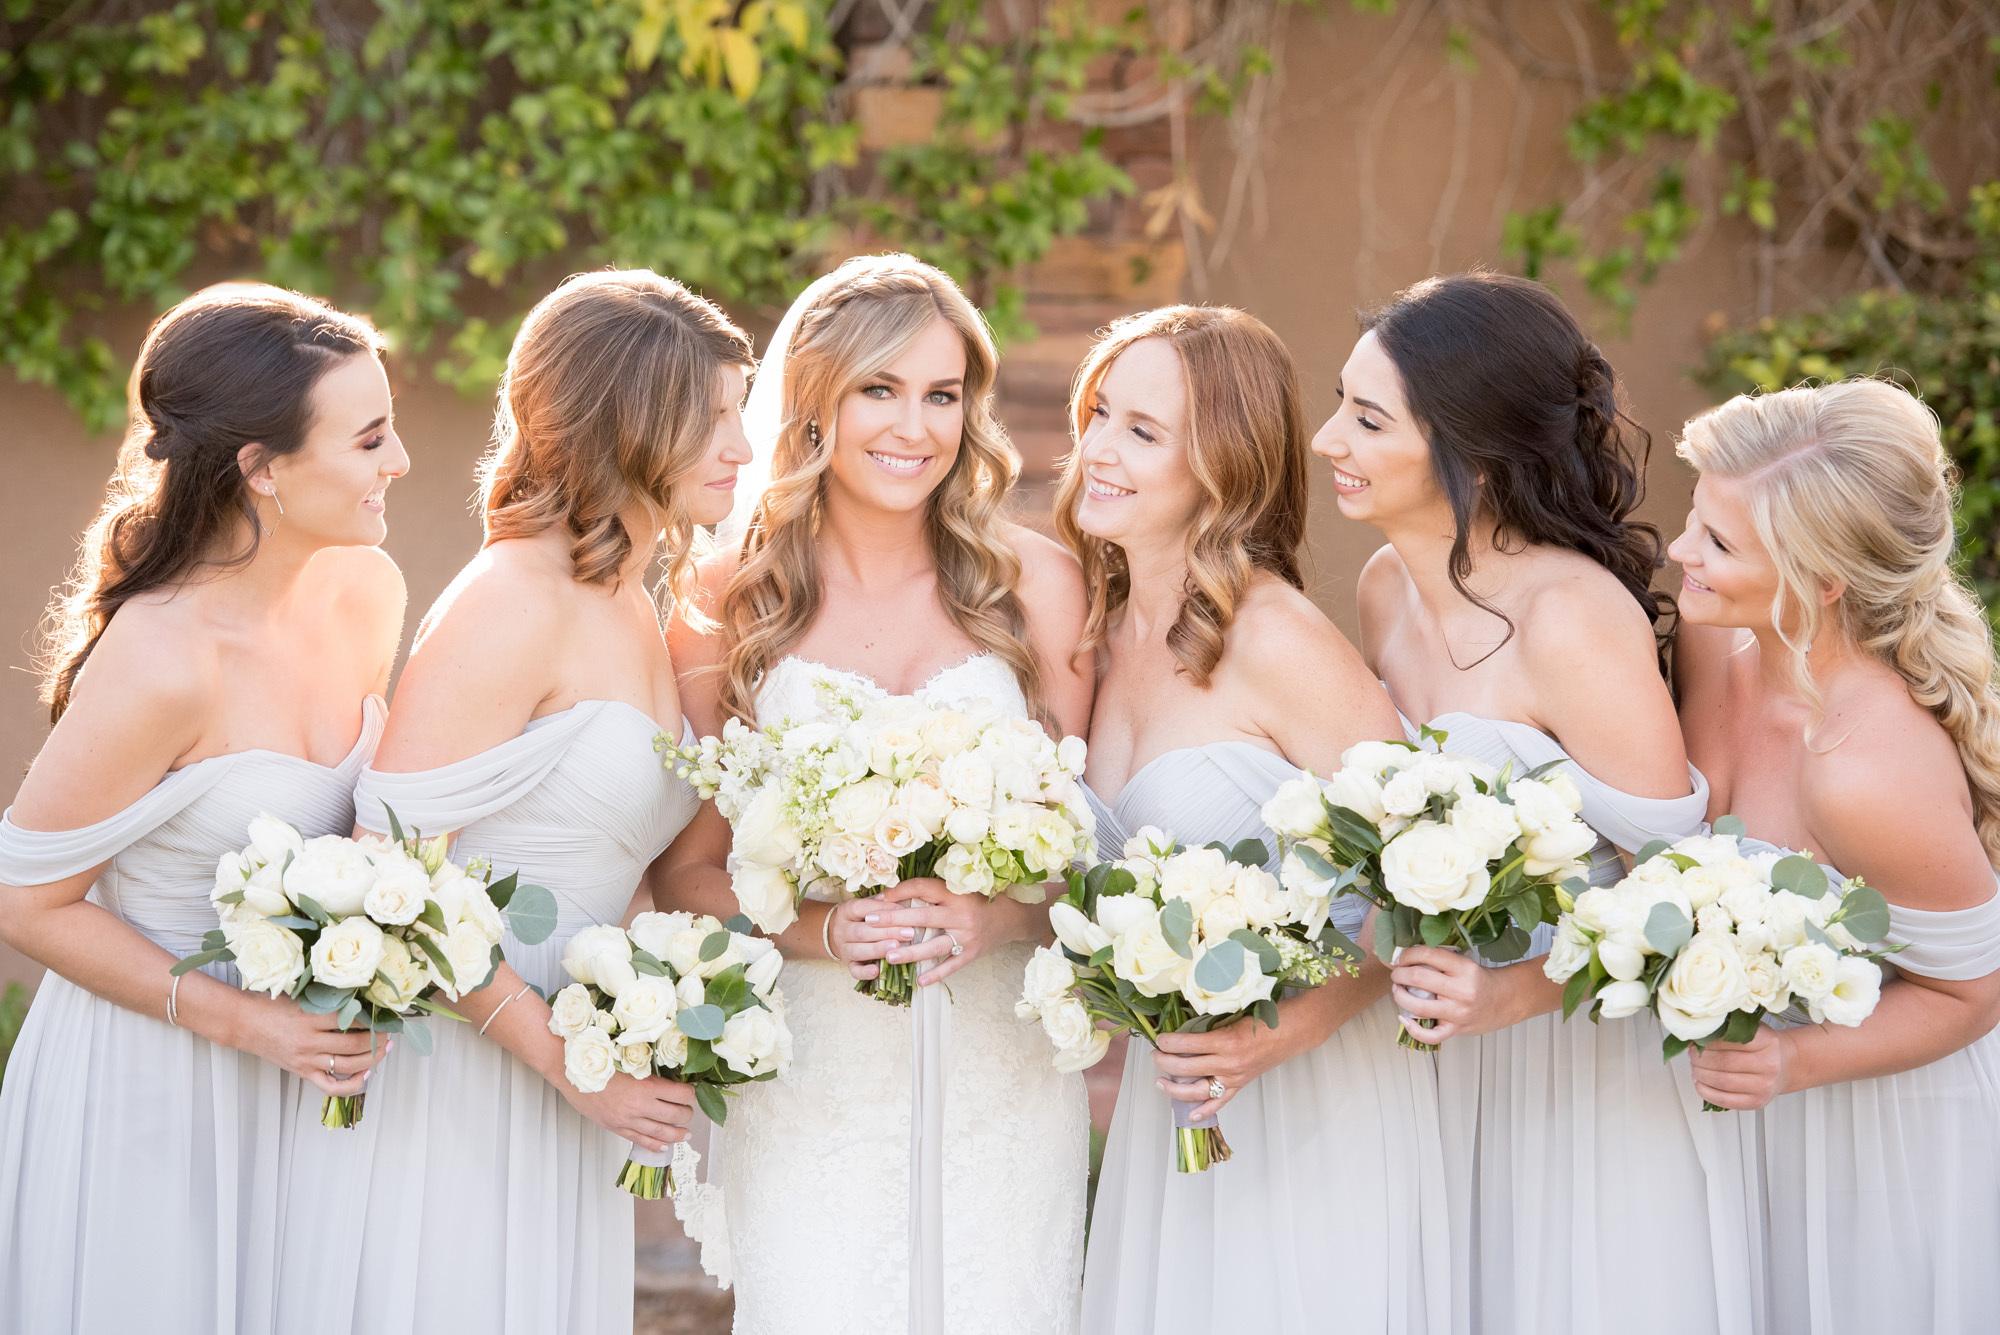 las vegas wedding planner angelica rose events bride and bridesmaids.jpg